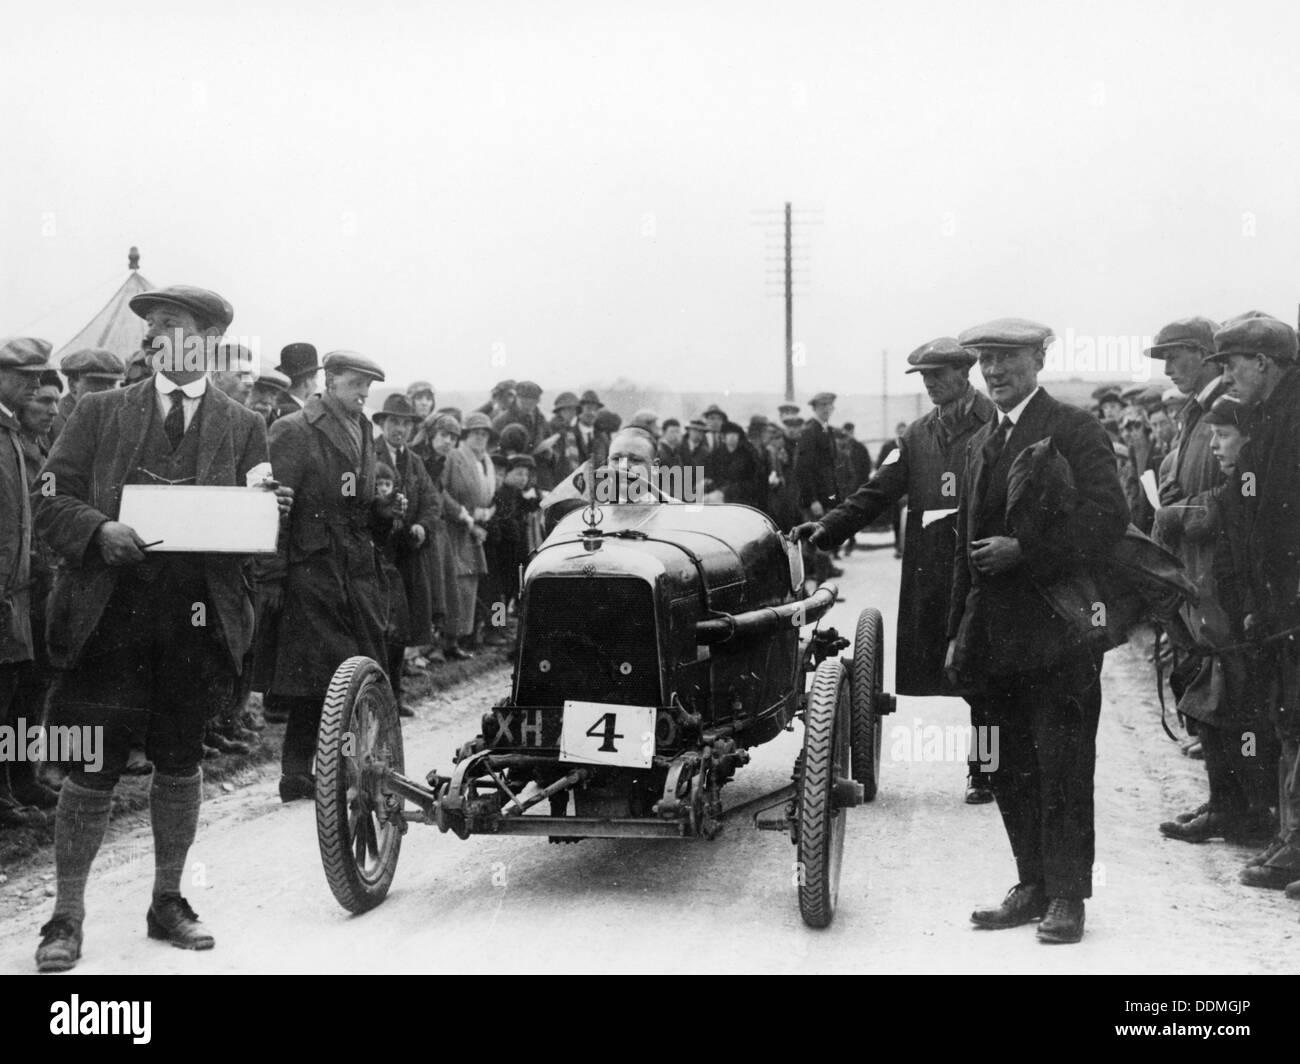 Aston Martin at a motor racing event, 1922. - Stock Image